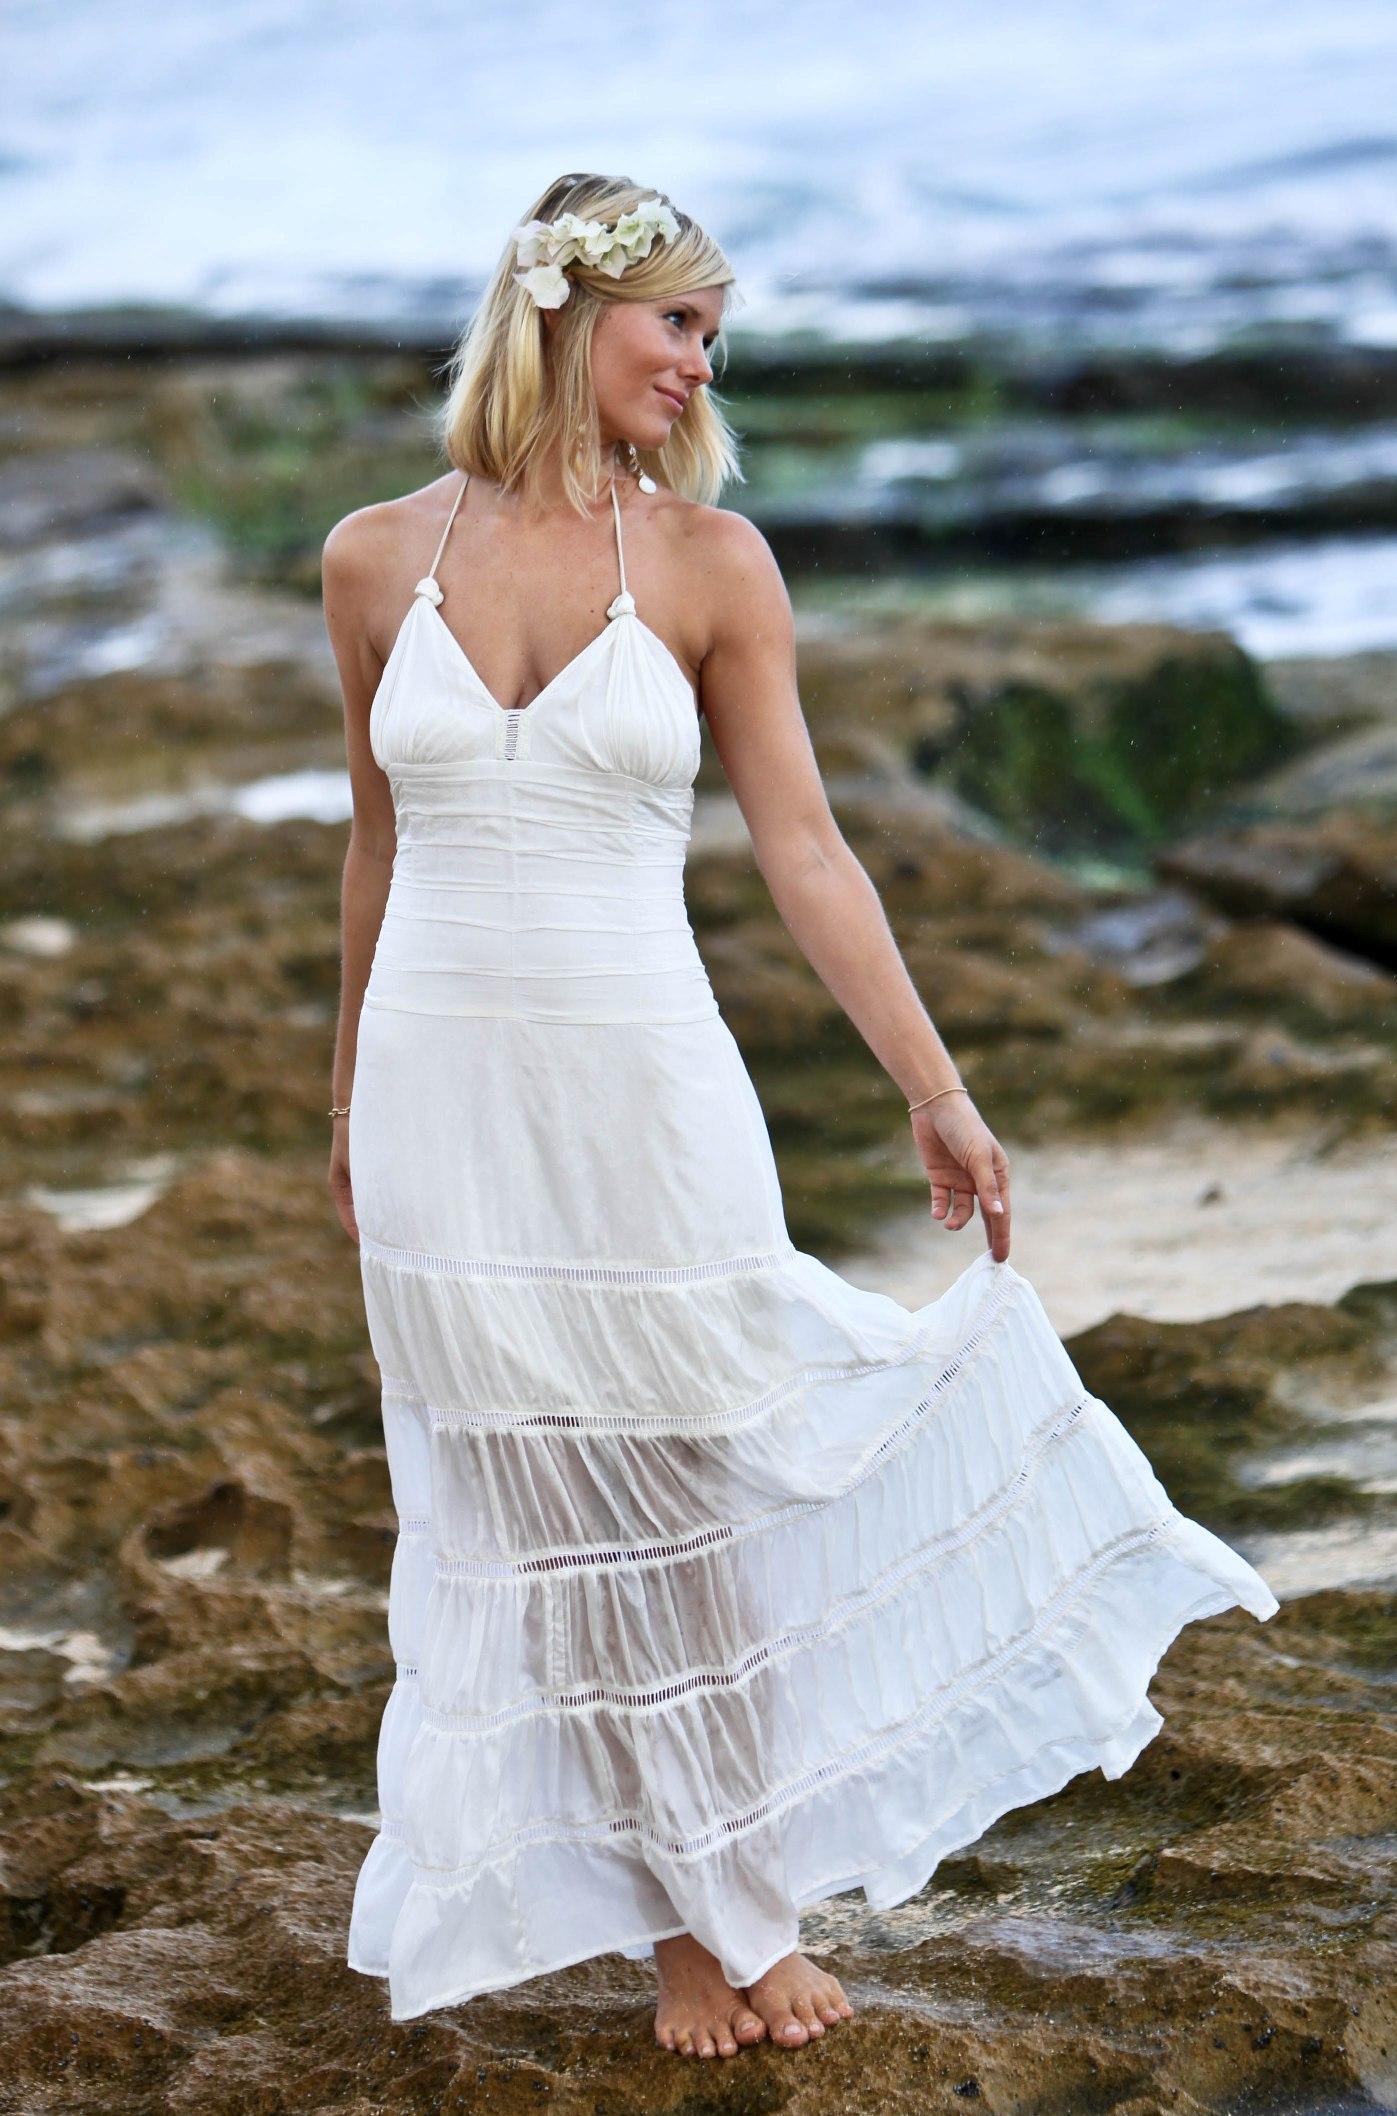 Wedding Dresses, Fashion, white, dress, Halter, Silk, Layered, Tamara catz, Tamara, Catz, halter wedding dresses, Silk Wedding Dresses